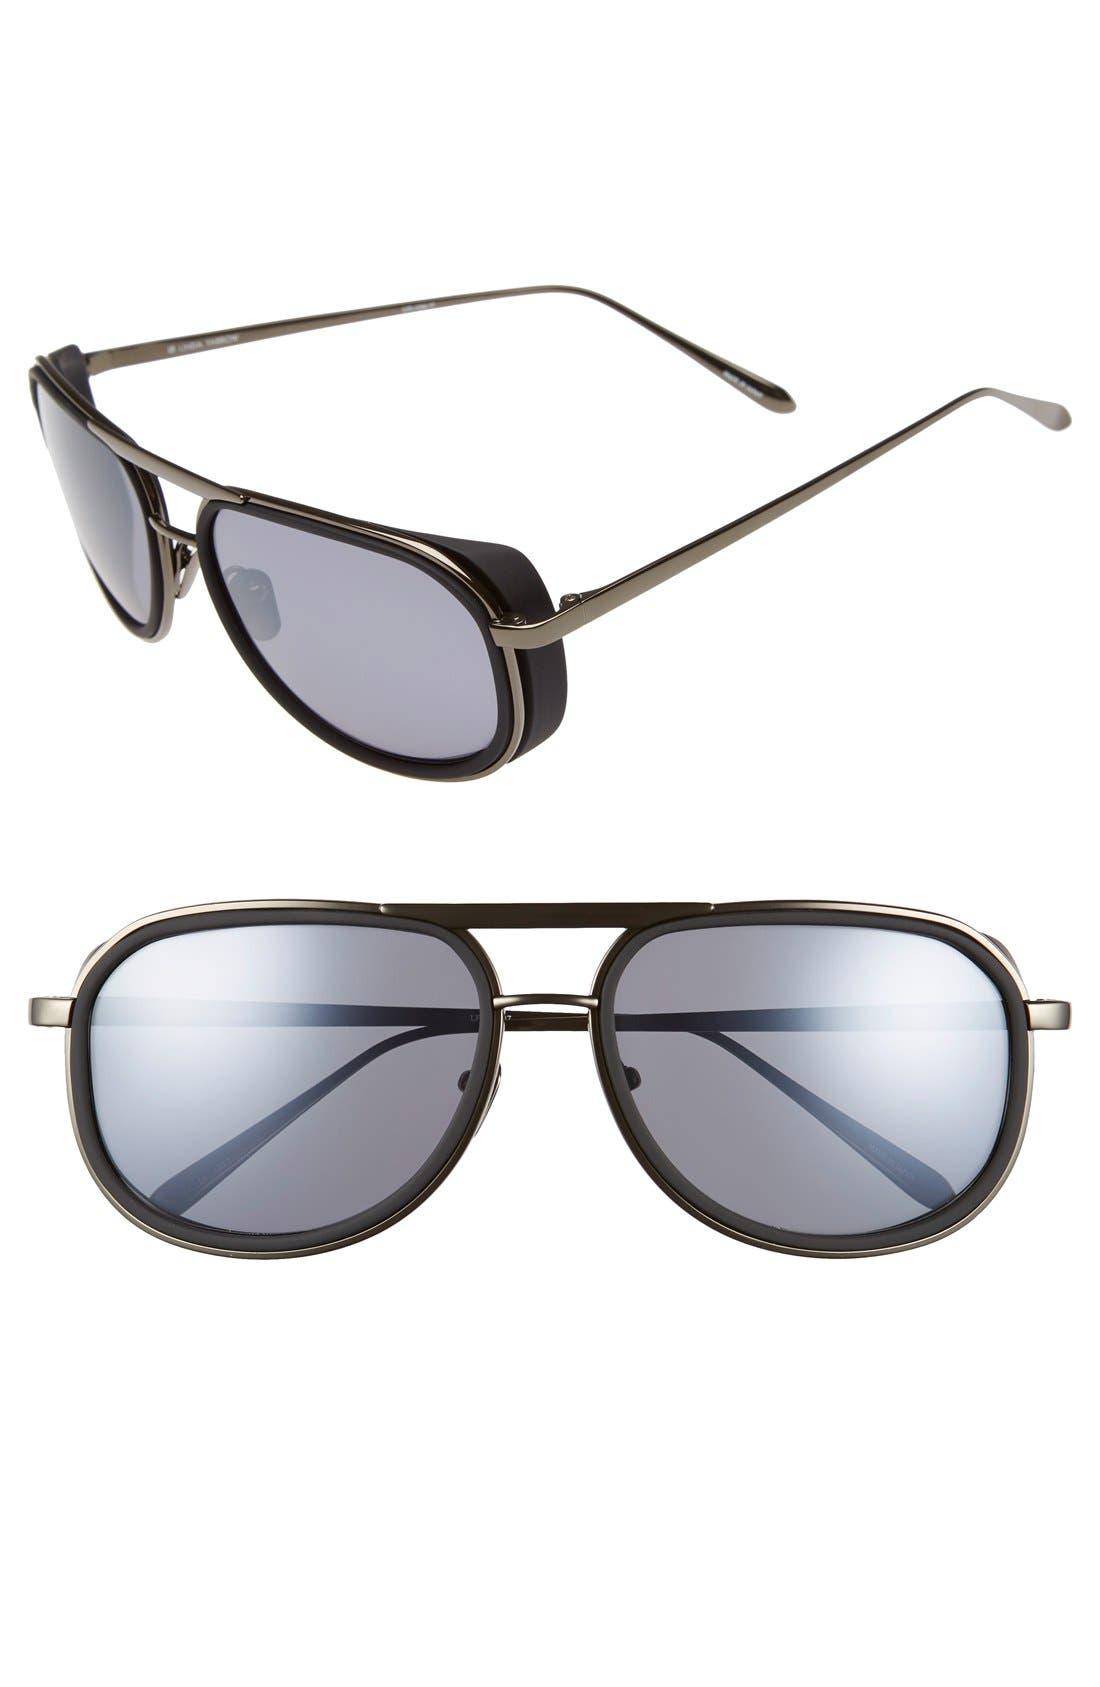 58mm Sunglasses,                             Main thumbnail 1, color,                             001